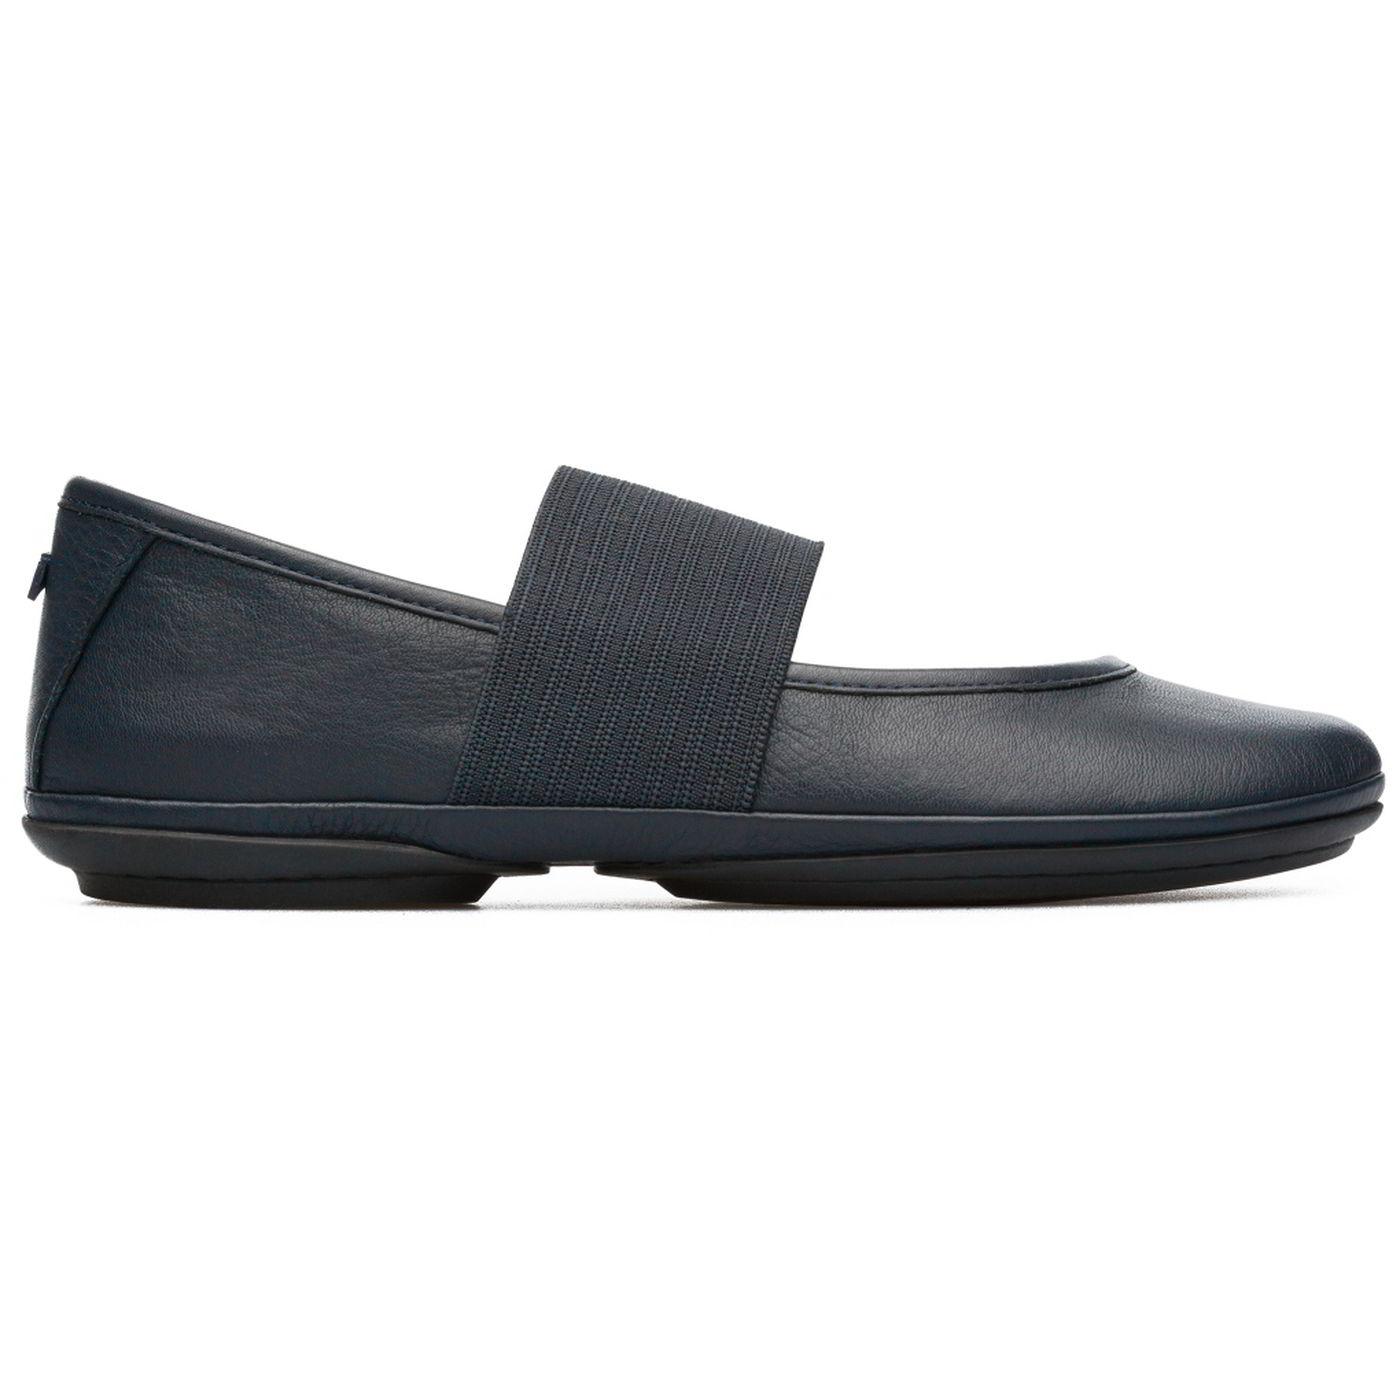 Camper Womens Right Nina 21595 Ballet Pumps Shoes - Dark Blue